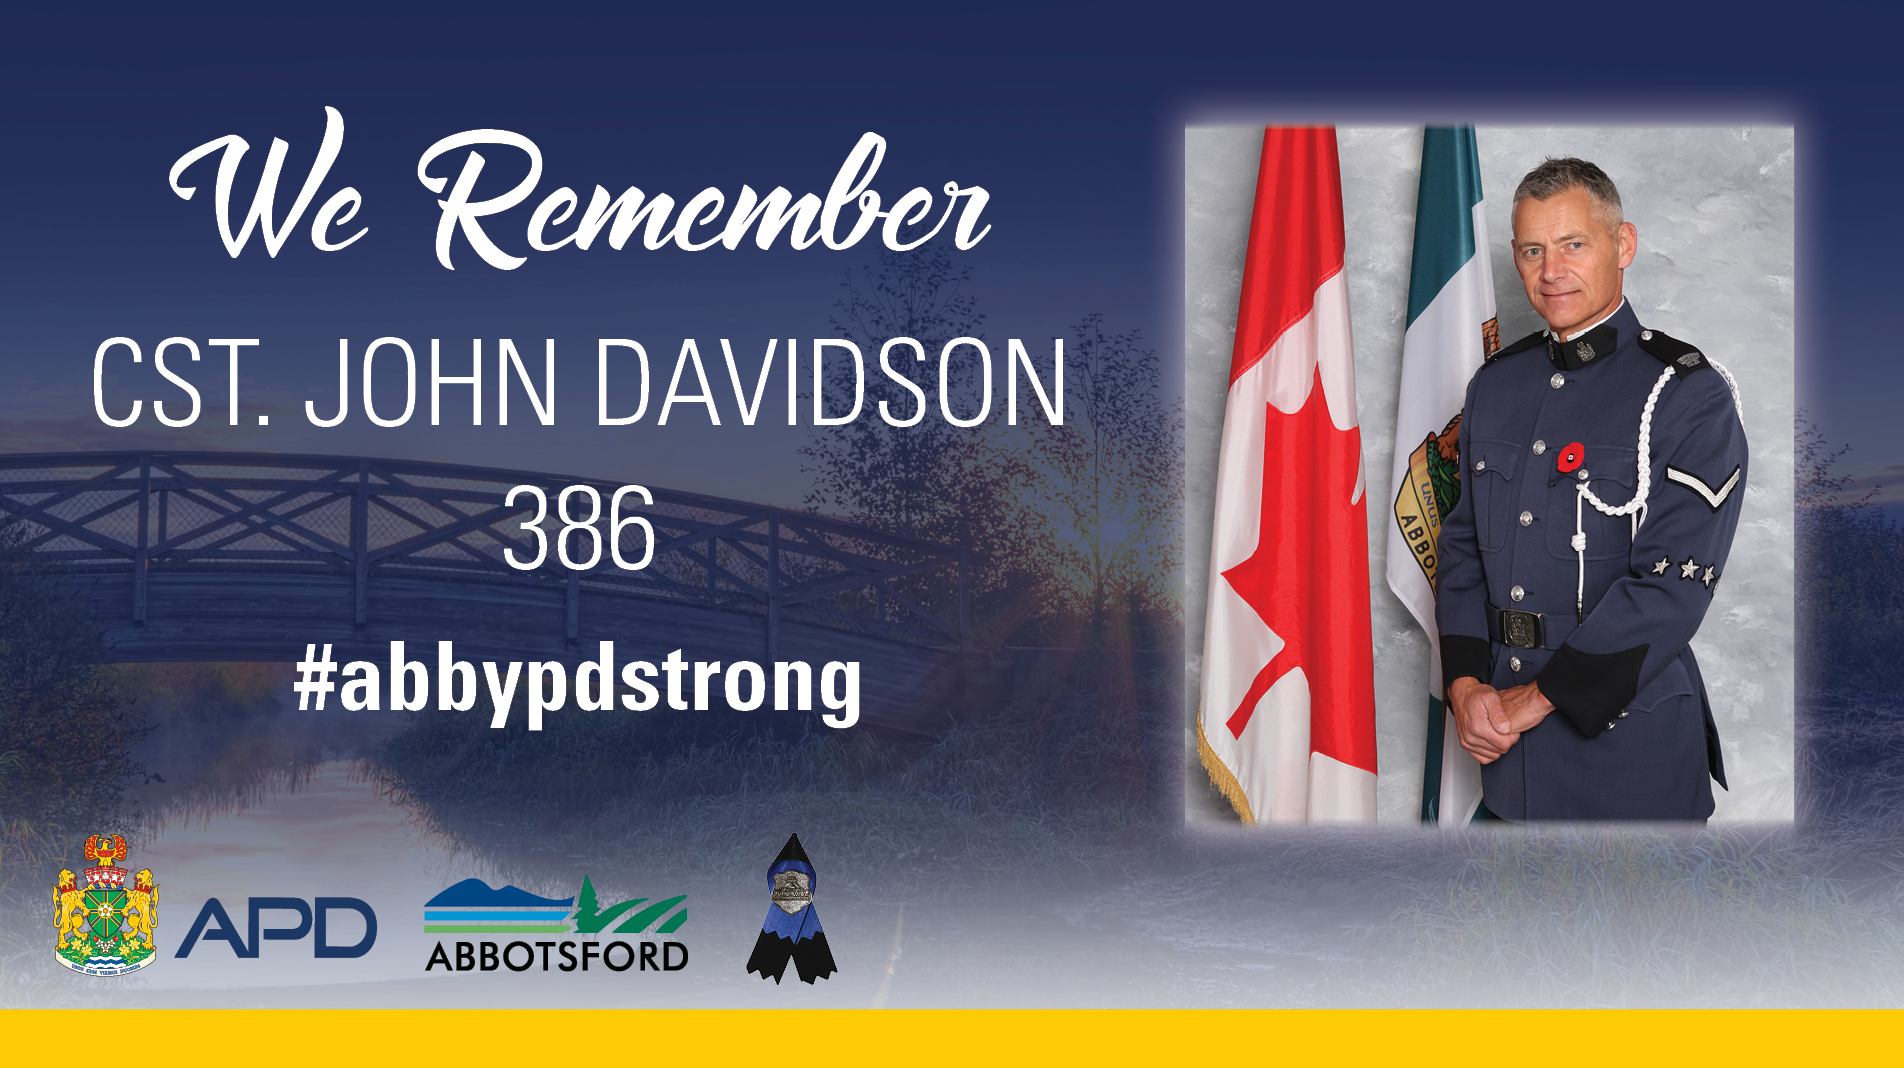 Here's Information on Cst. John Davidson's Celebration of Life